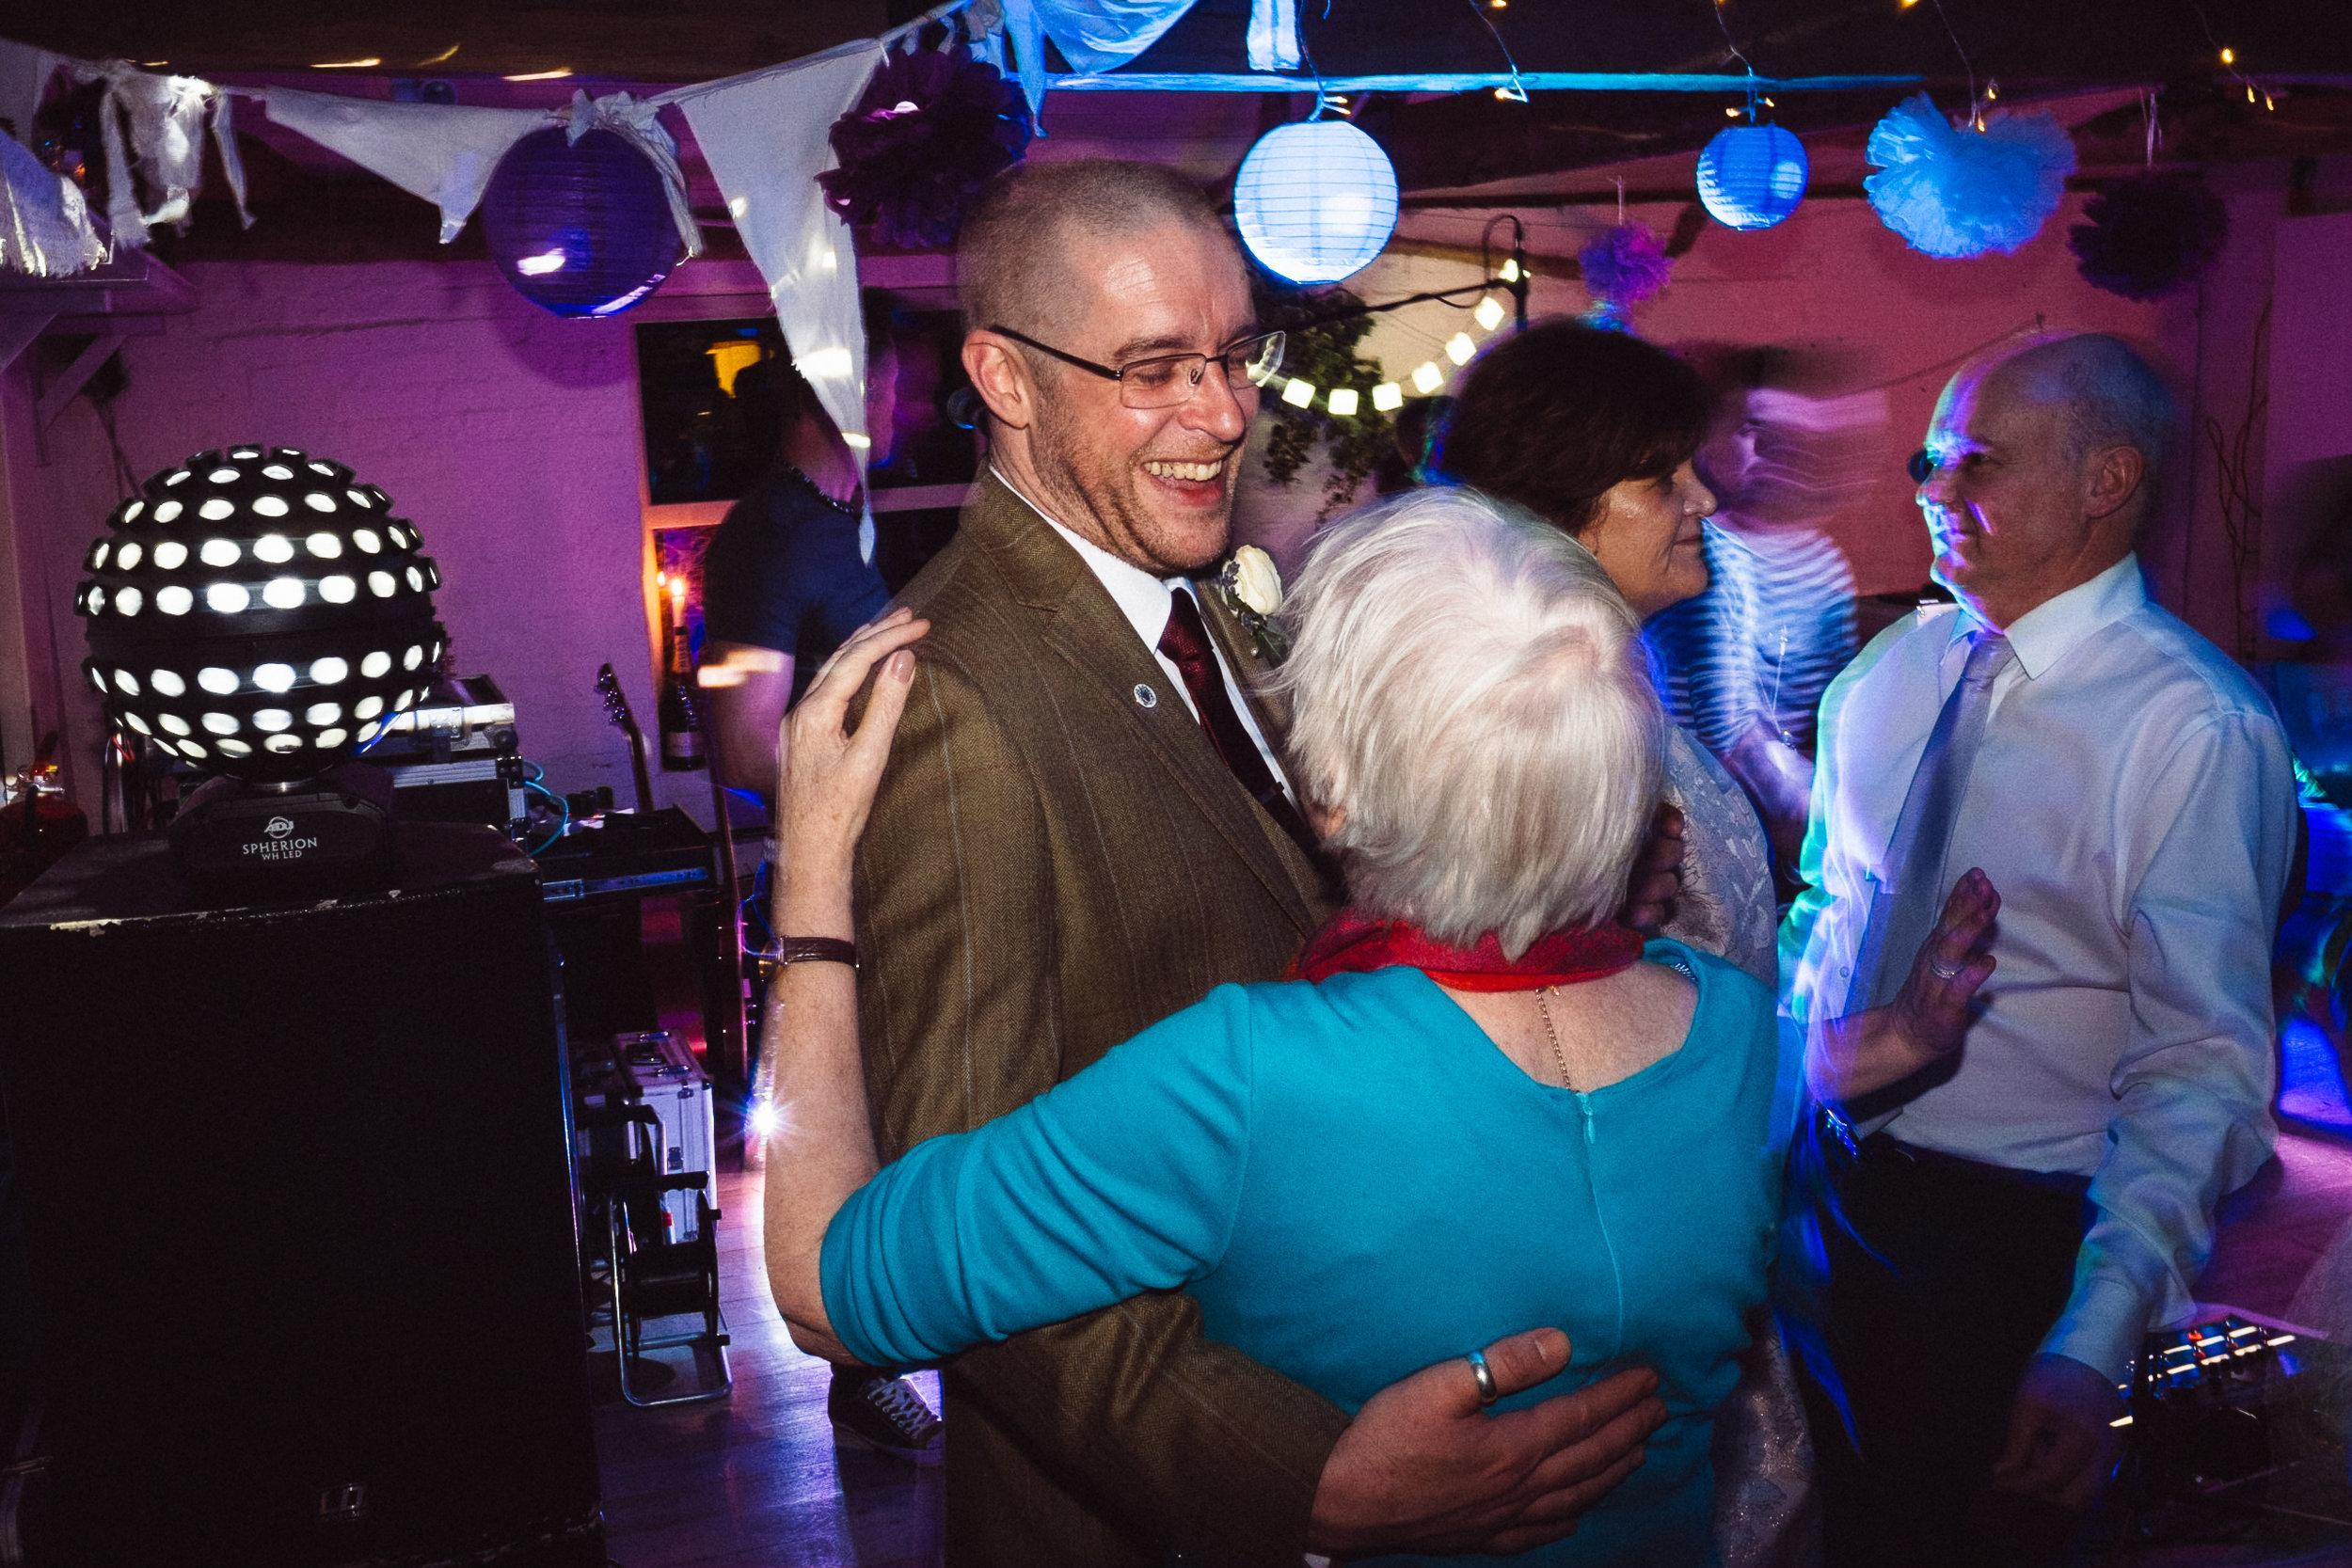 Hereford_wedding_photographer29.jpg